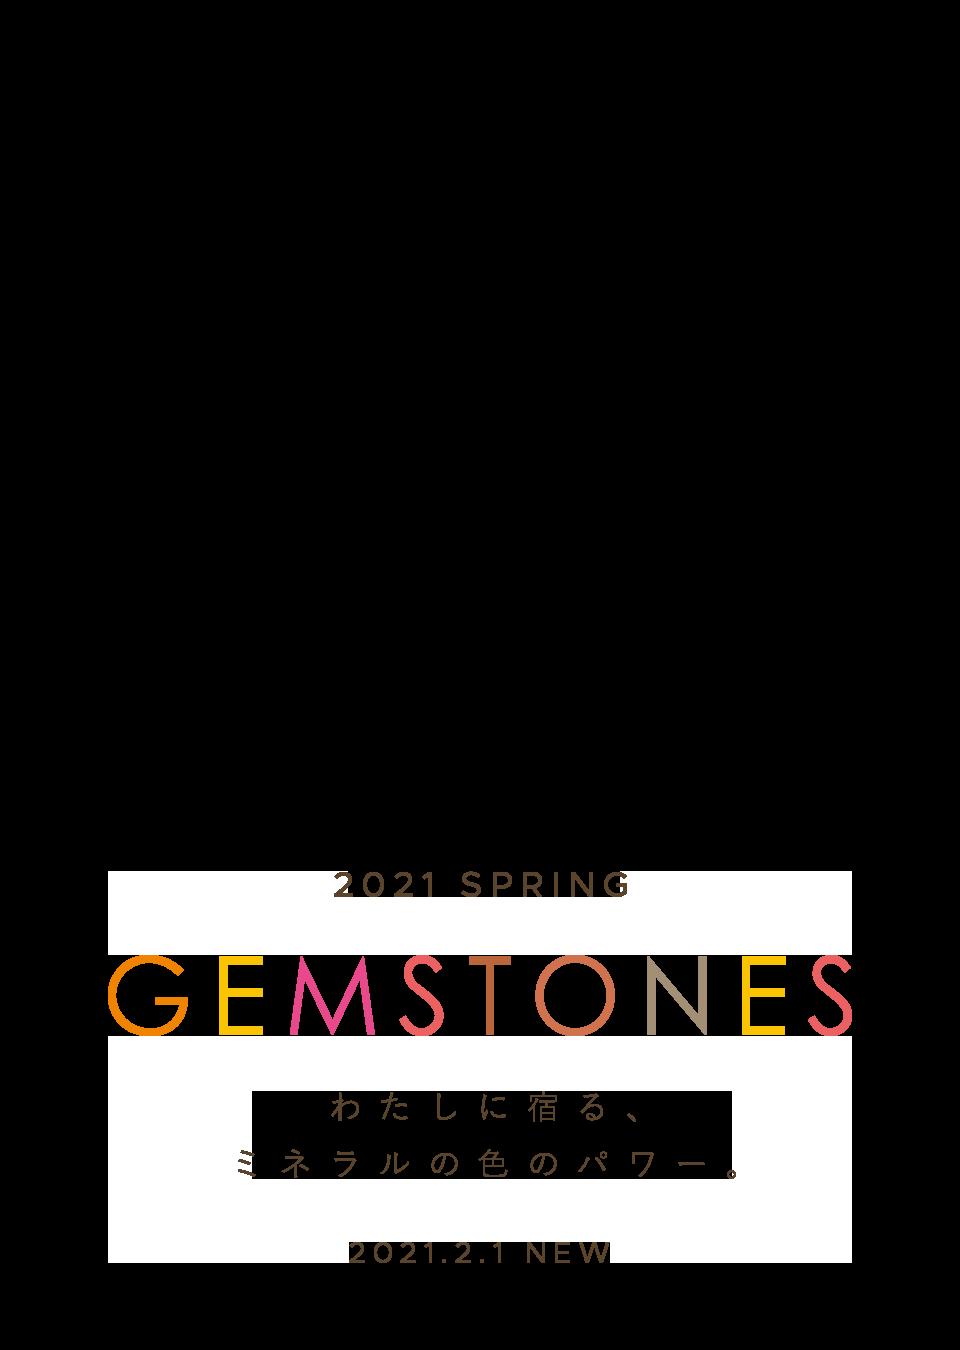 2021 SPRING GEMSTONES